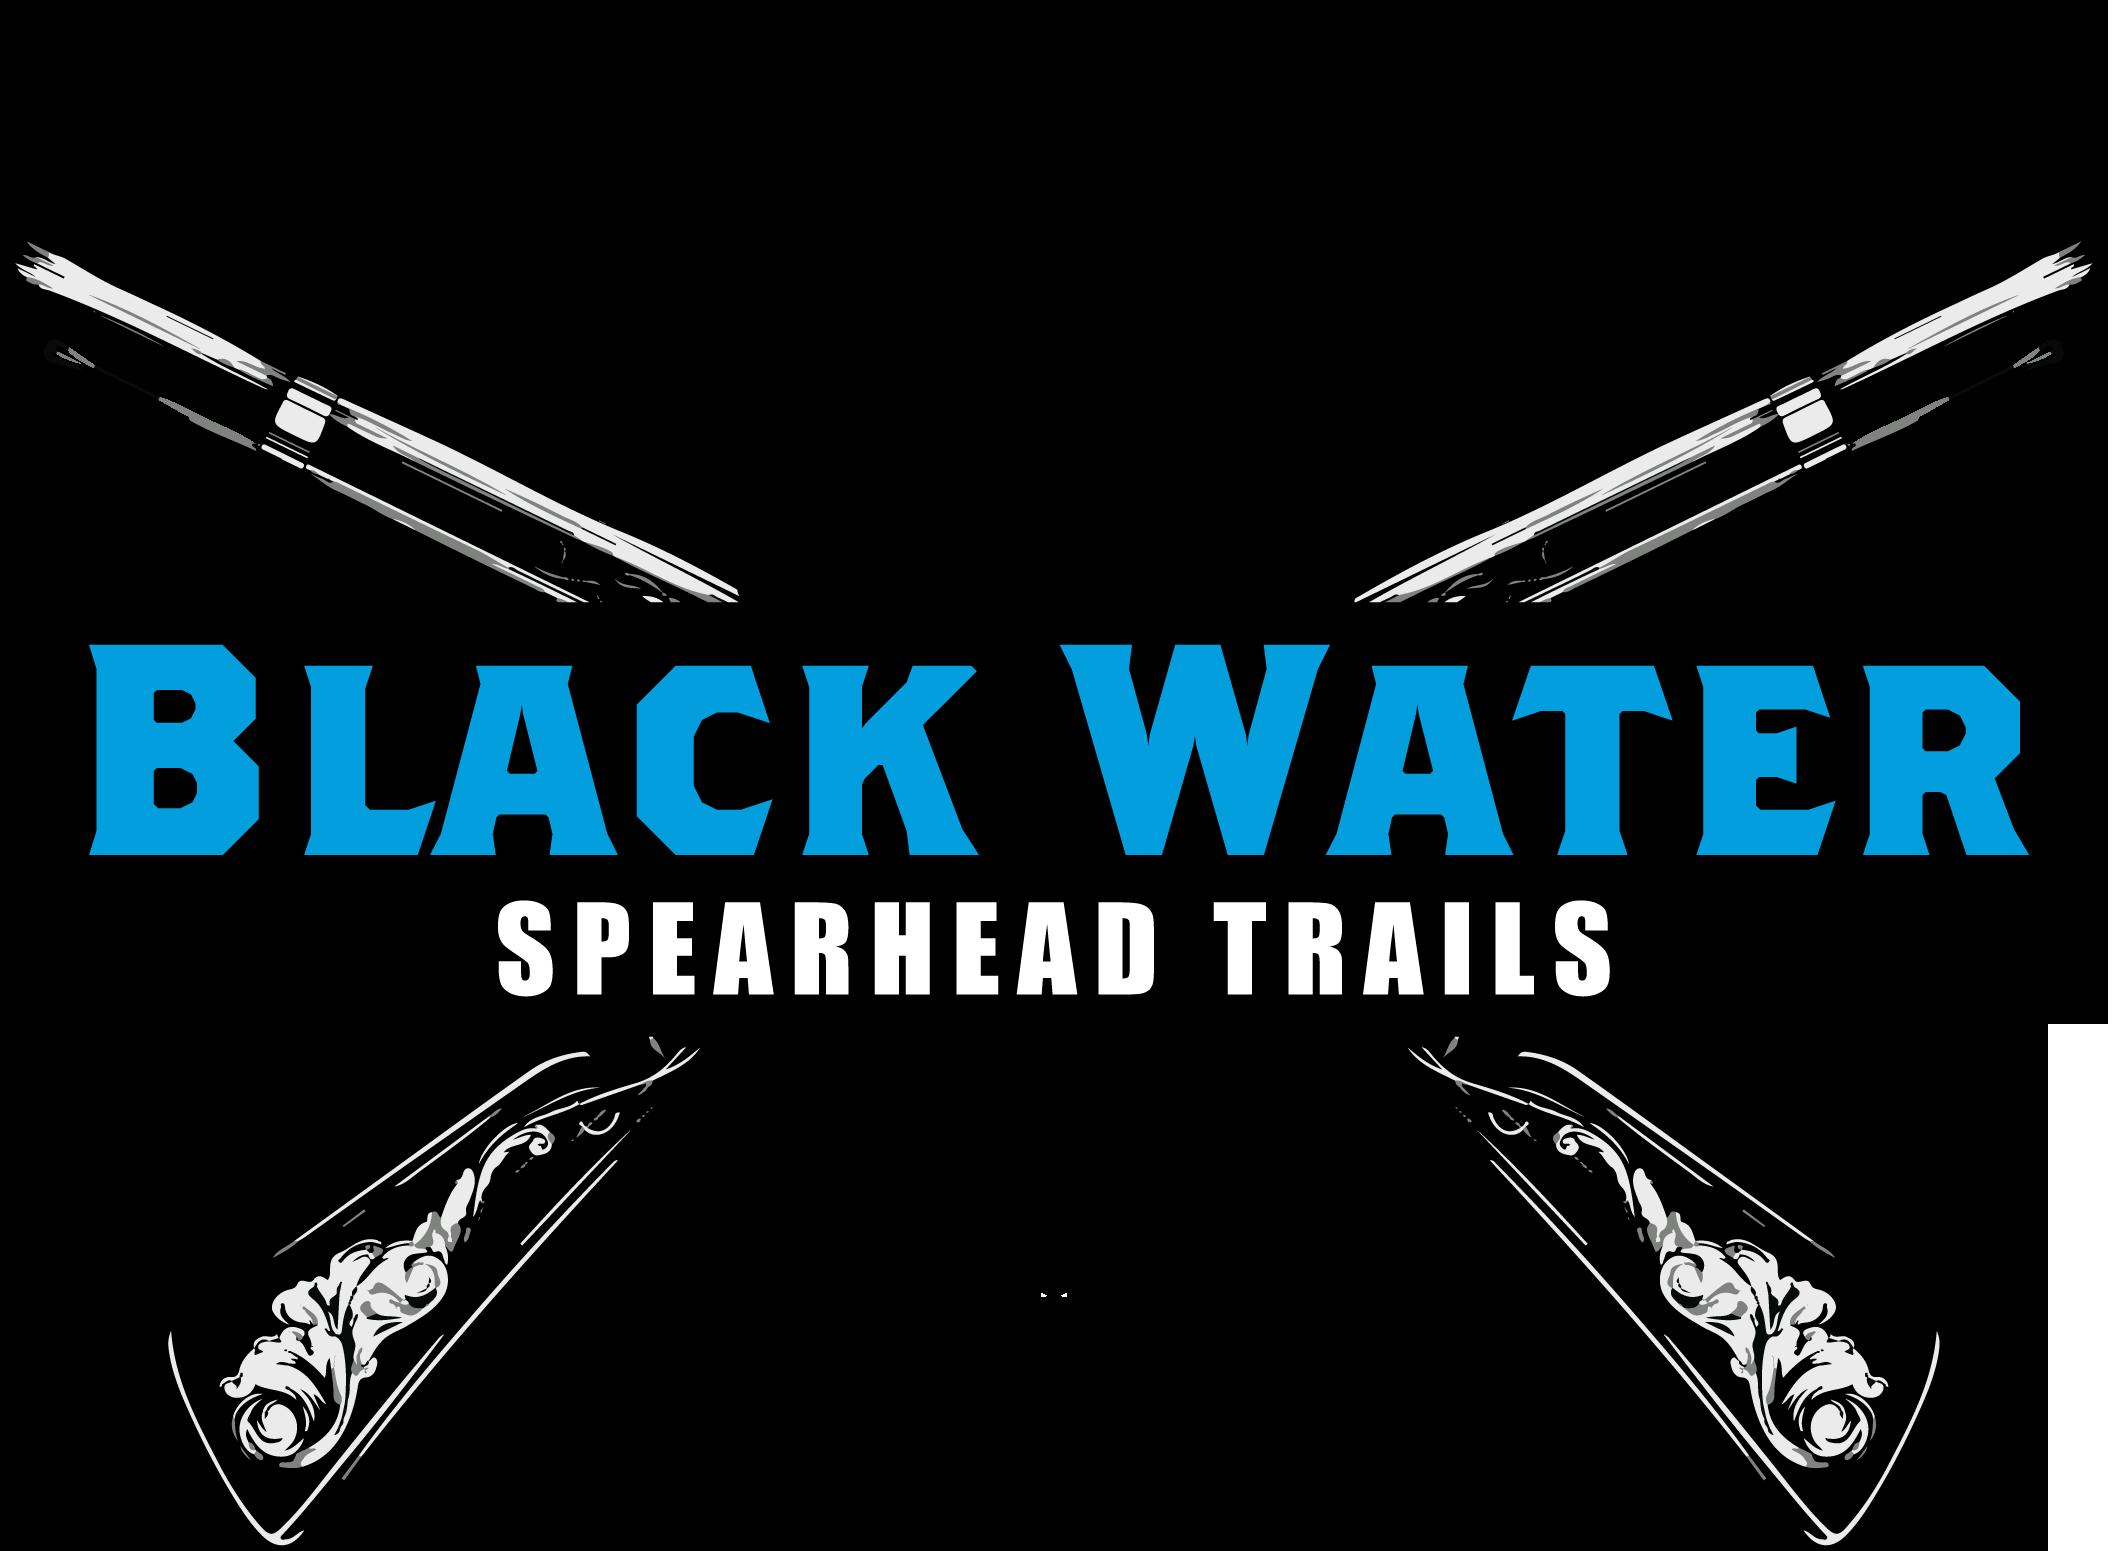 https://secureservercdn.net/198.71.233.199/798.e5e.myftpupload.com/wp-content/uploads/2020/05/black-water2.png